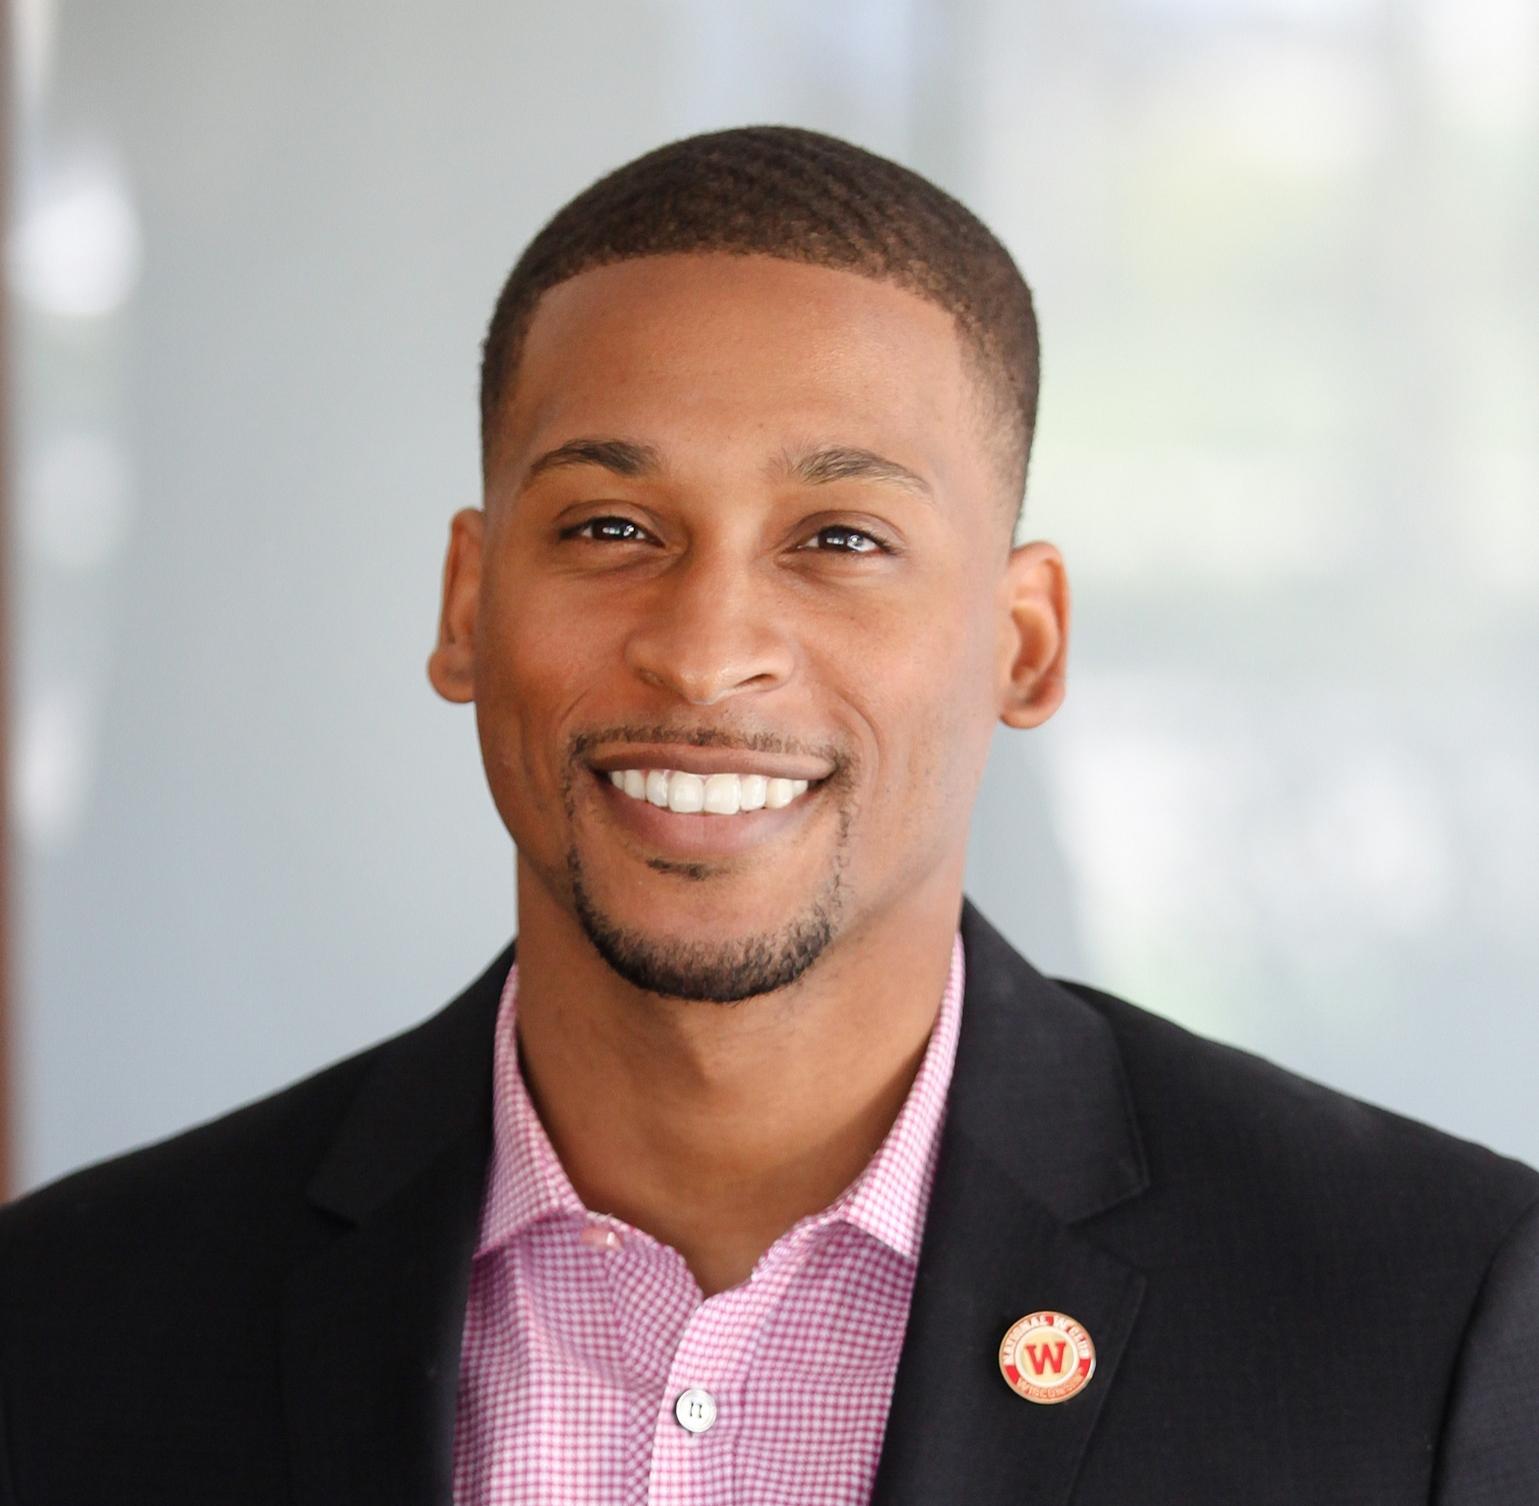 Brandon Williams, Athlete & Entrepreneur